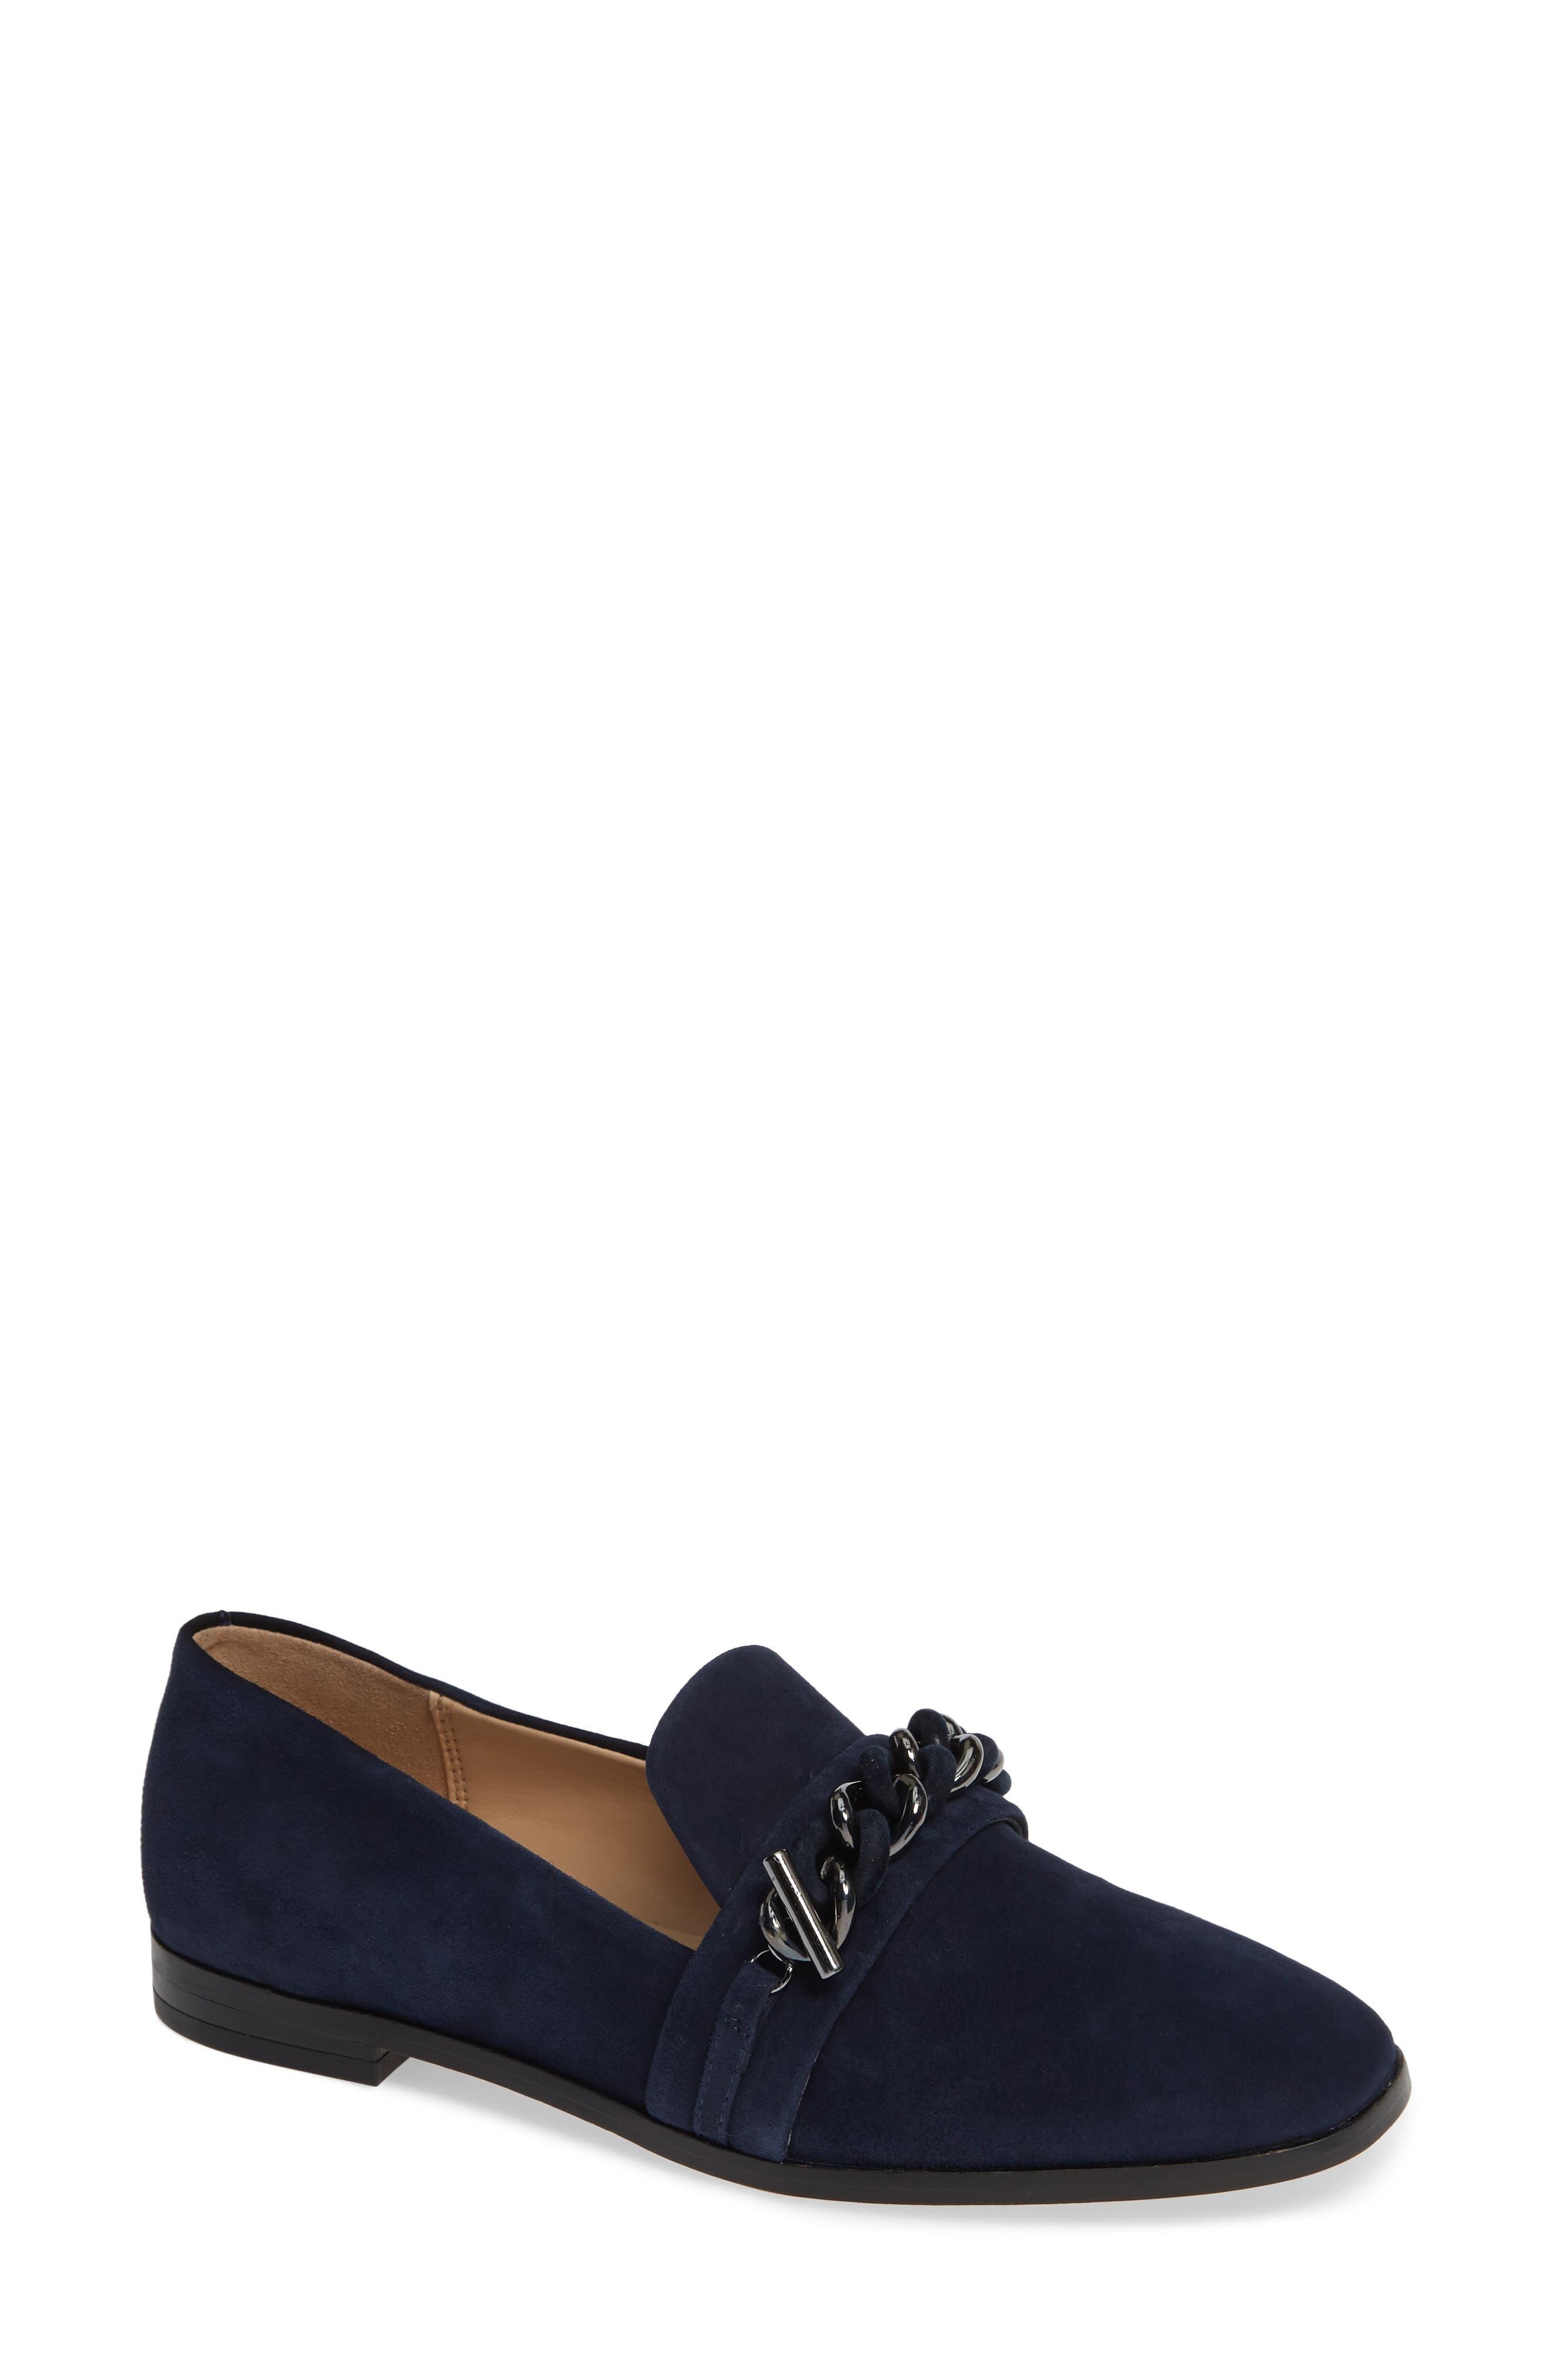 Karl Lagerfeld Paris Lynette Flat, Blue